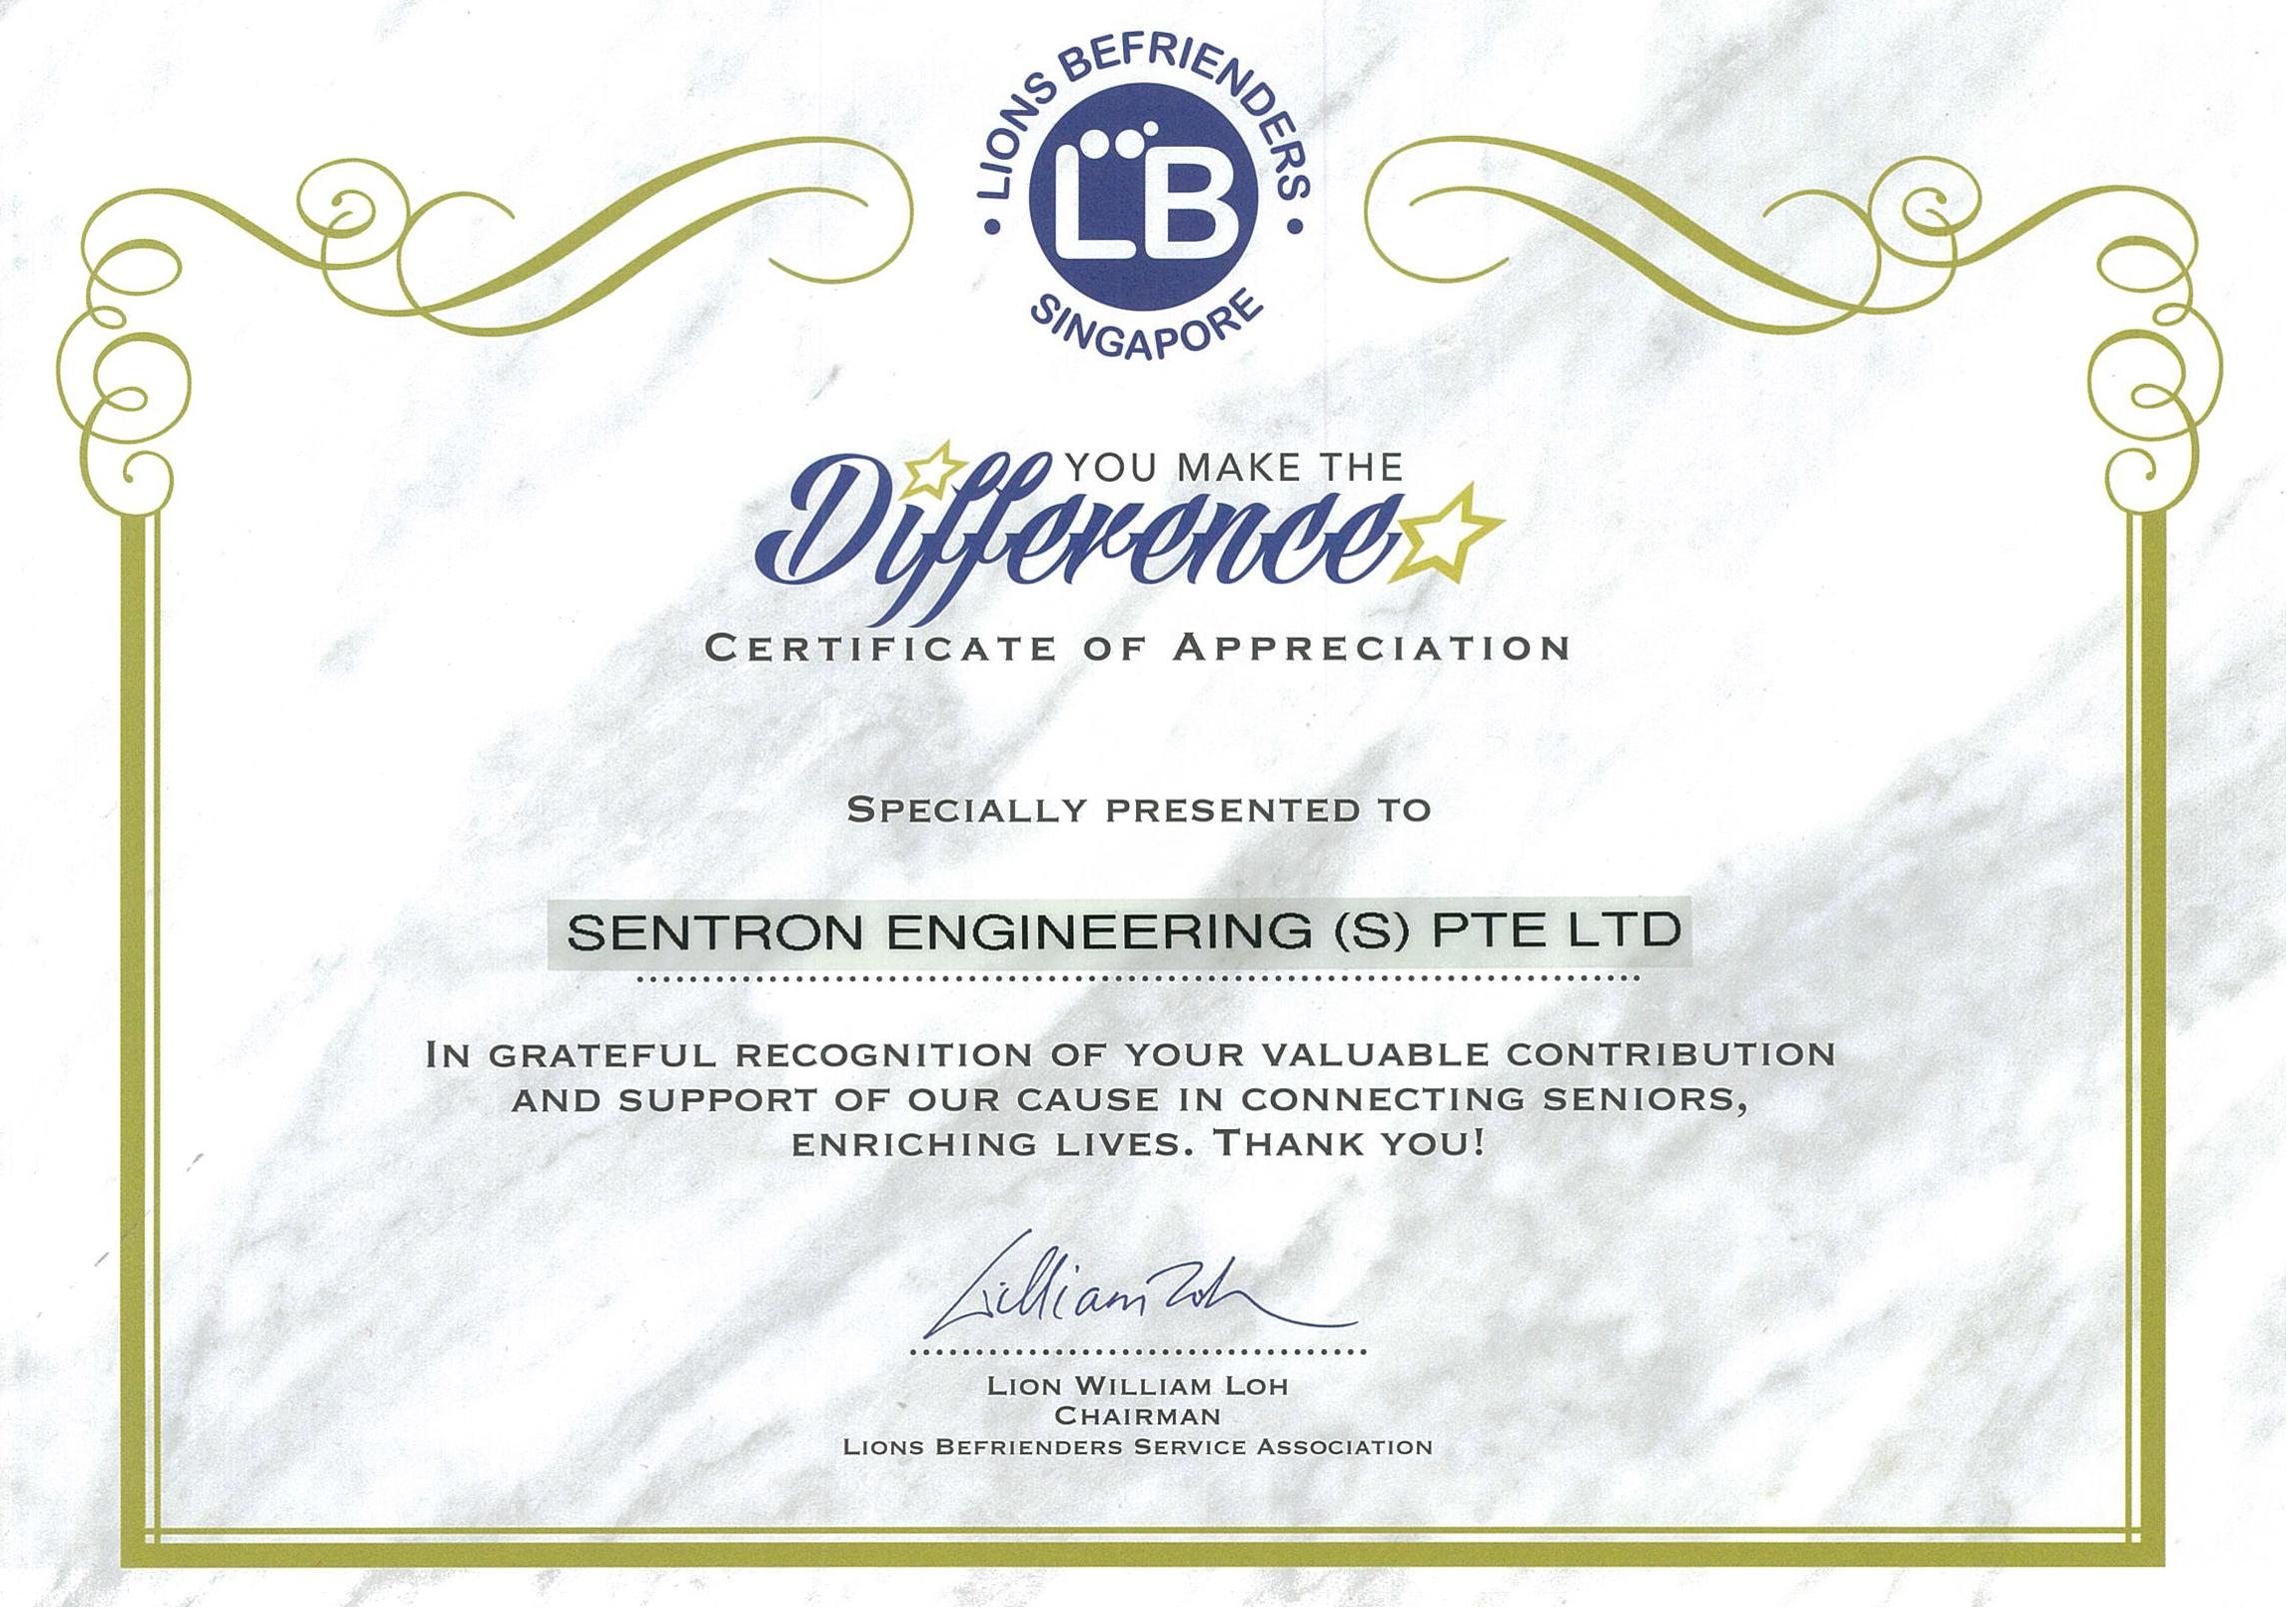 Sentron Engineering (S) Pte Ltd